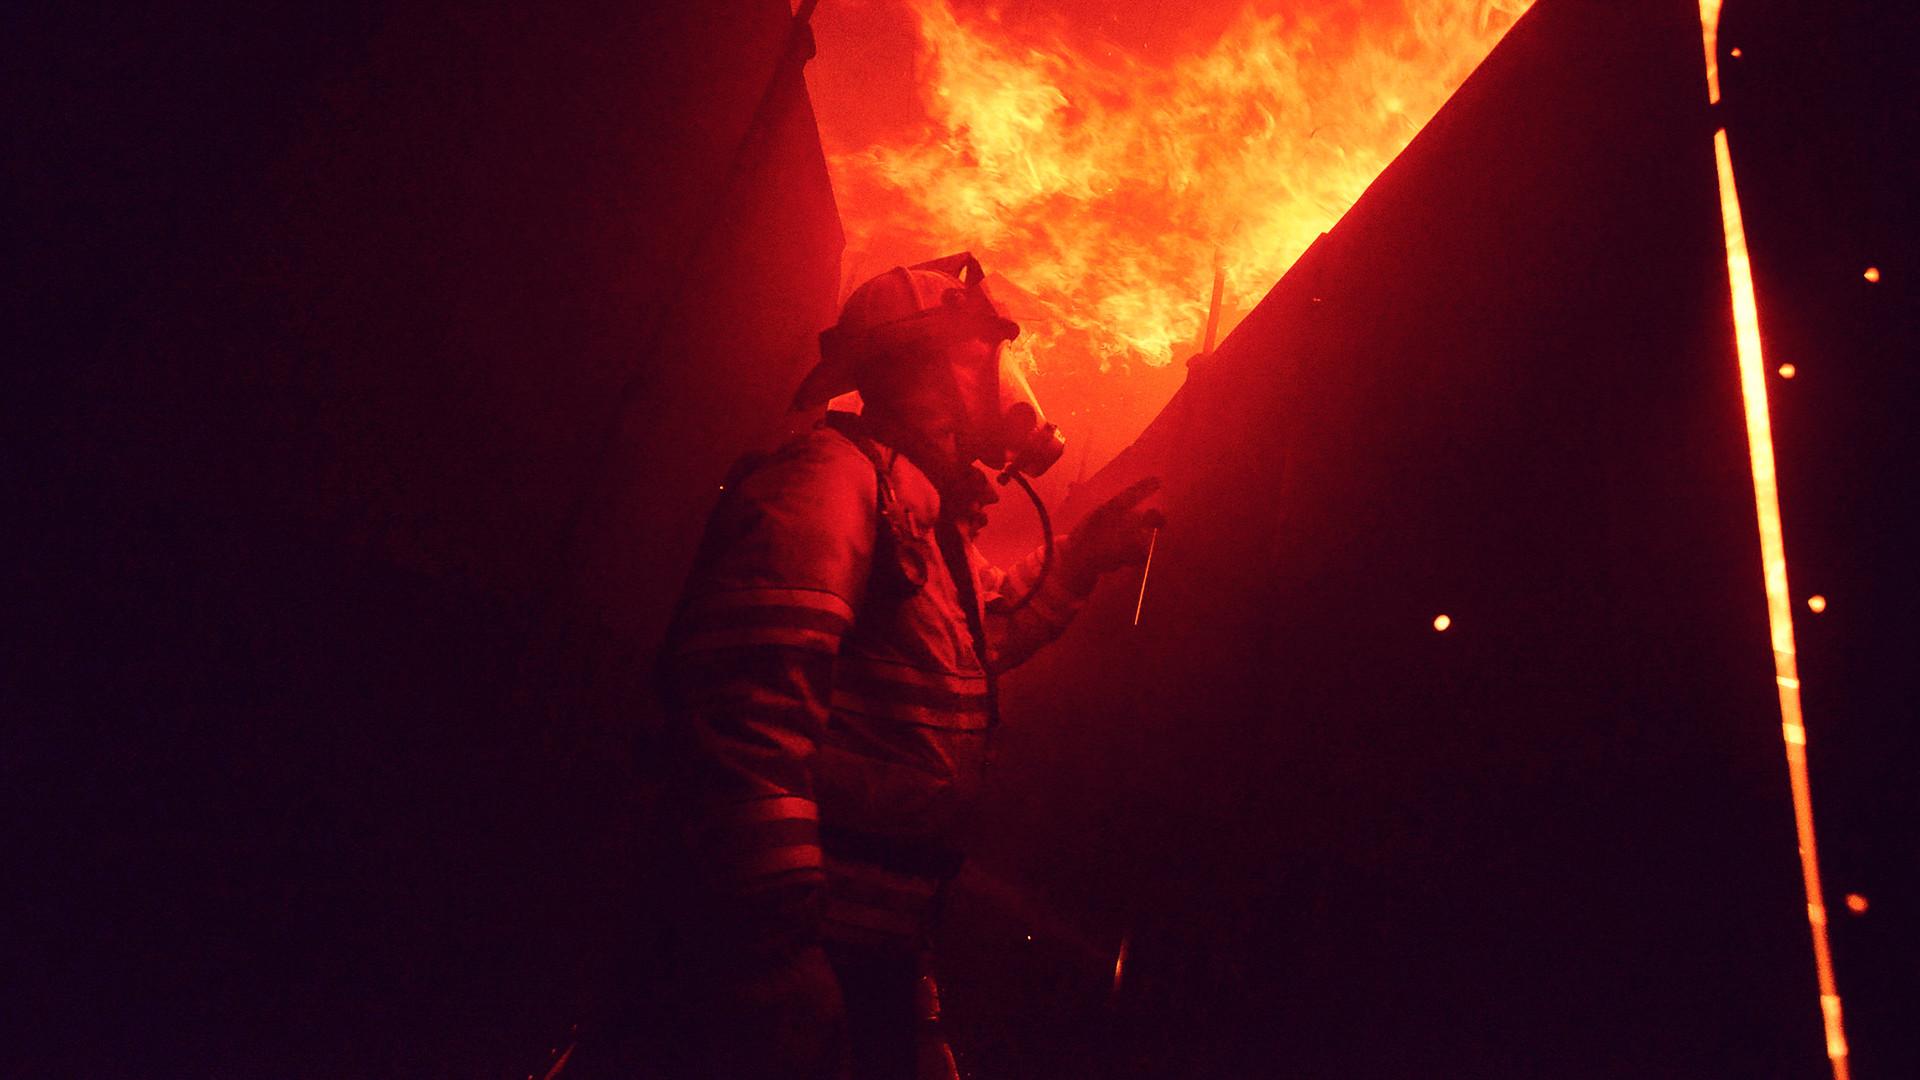 Hd Firefighter Wallpaper 65 Images